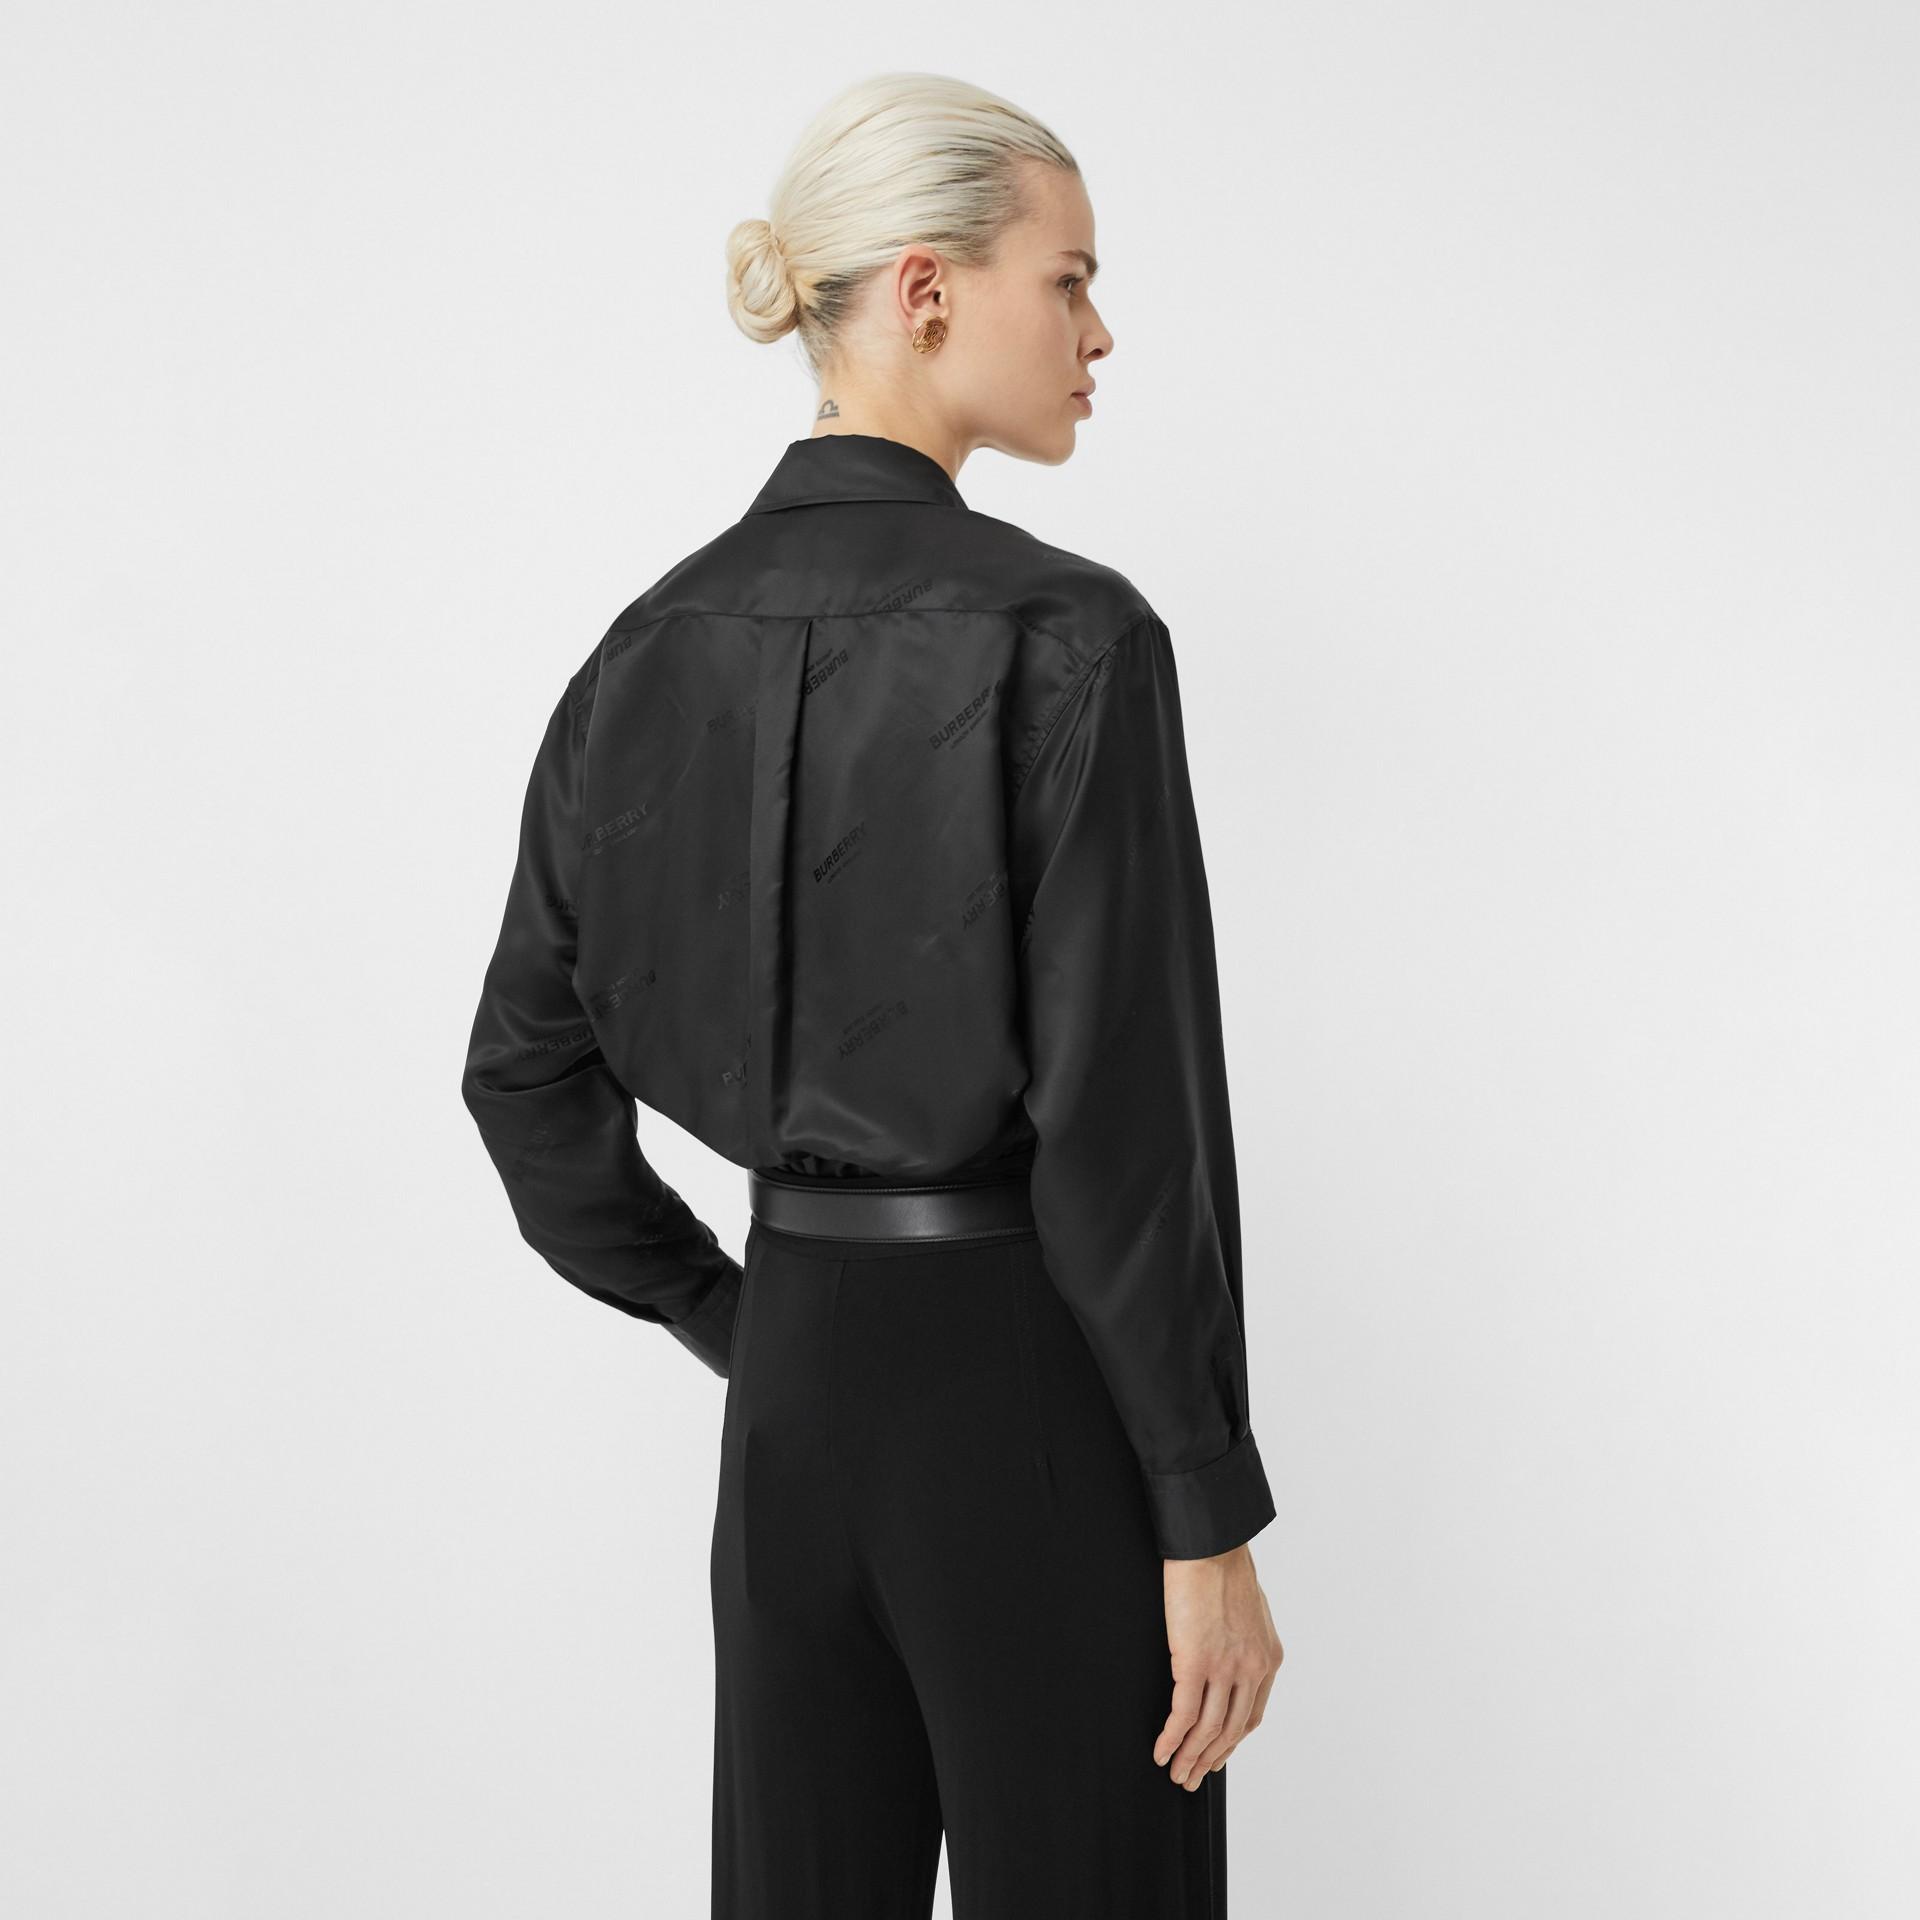 Logo Jacquard Shirt in Black - Women | Burberry - gallery image 2